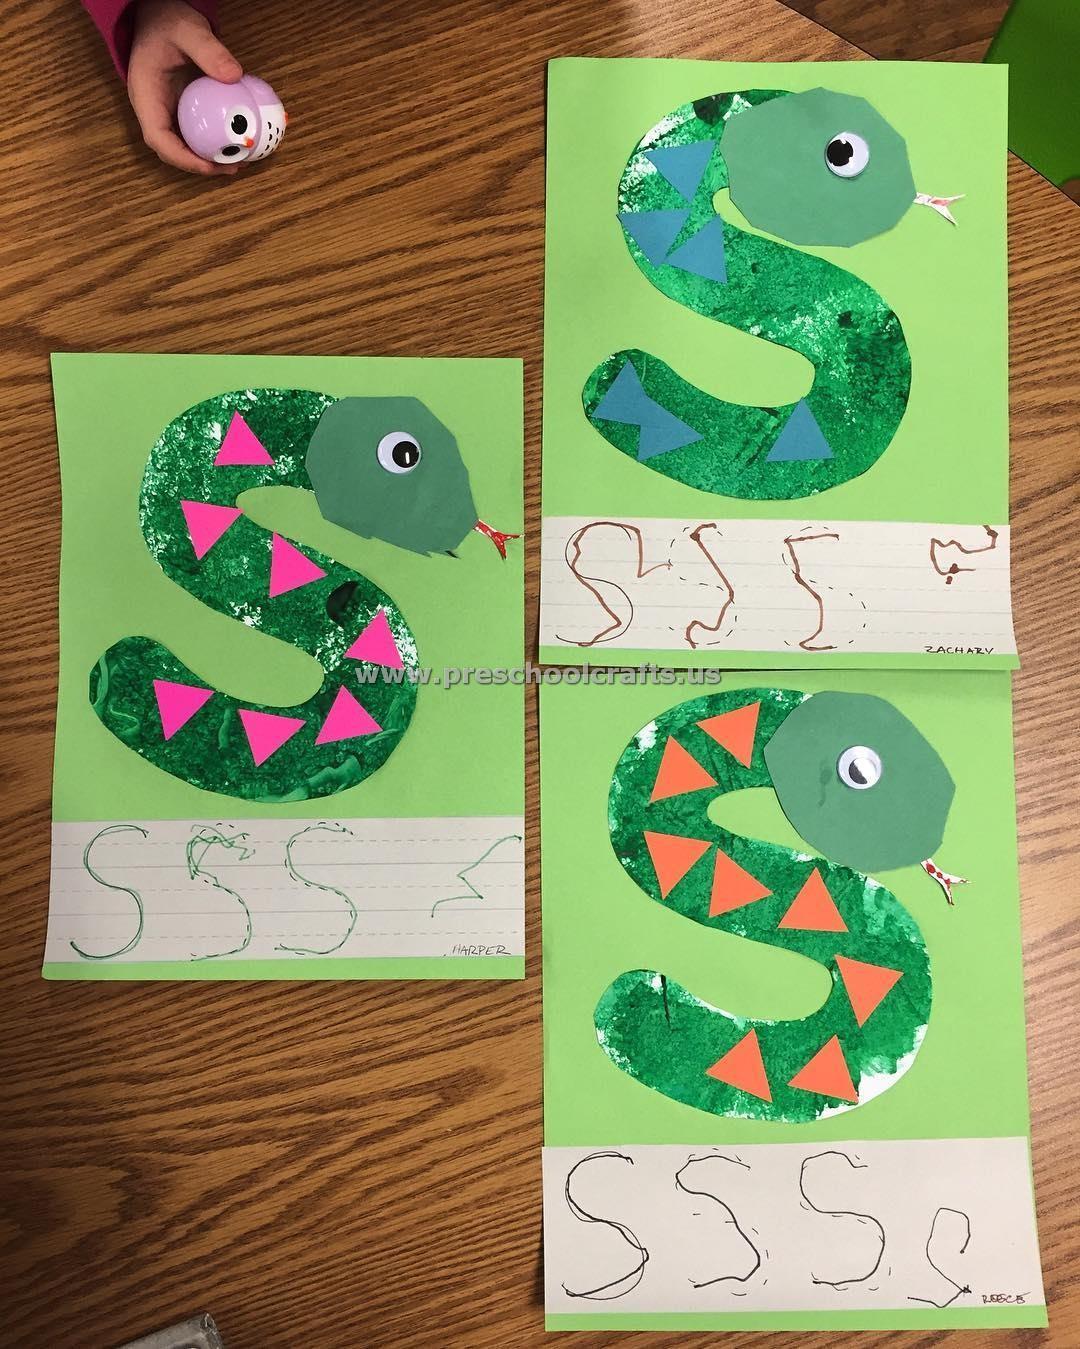 Letter s crafts for preschool enjoy preschool crafts for Letter k crafts for toddlers